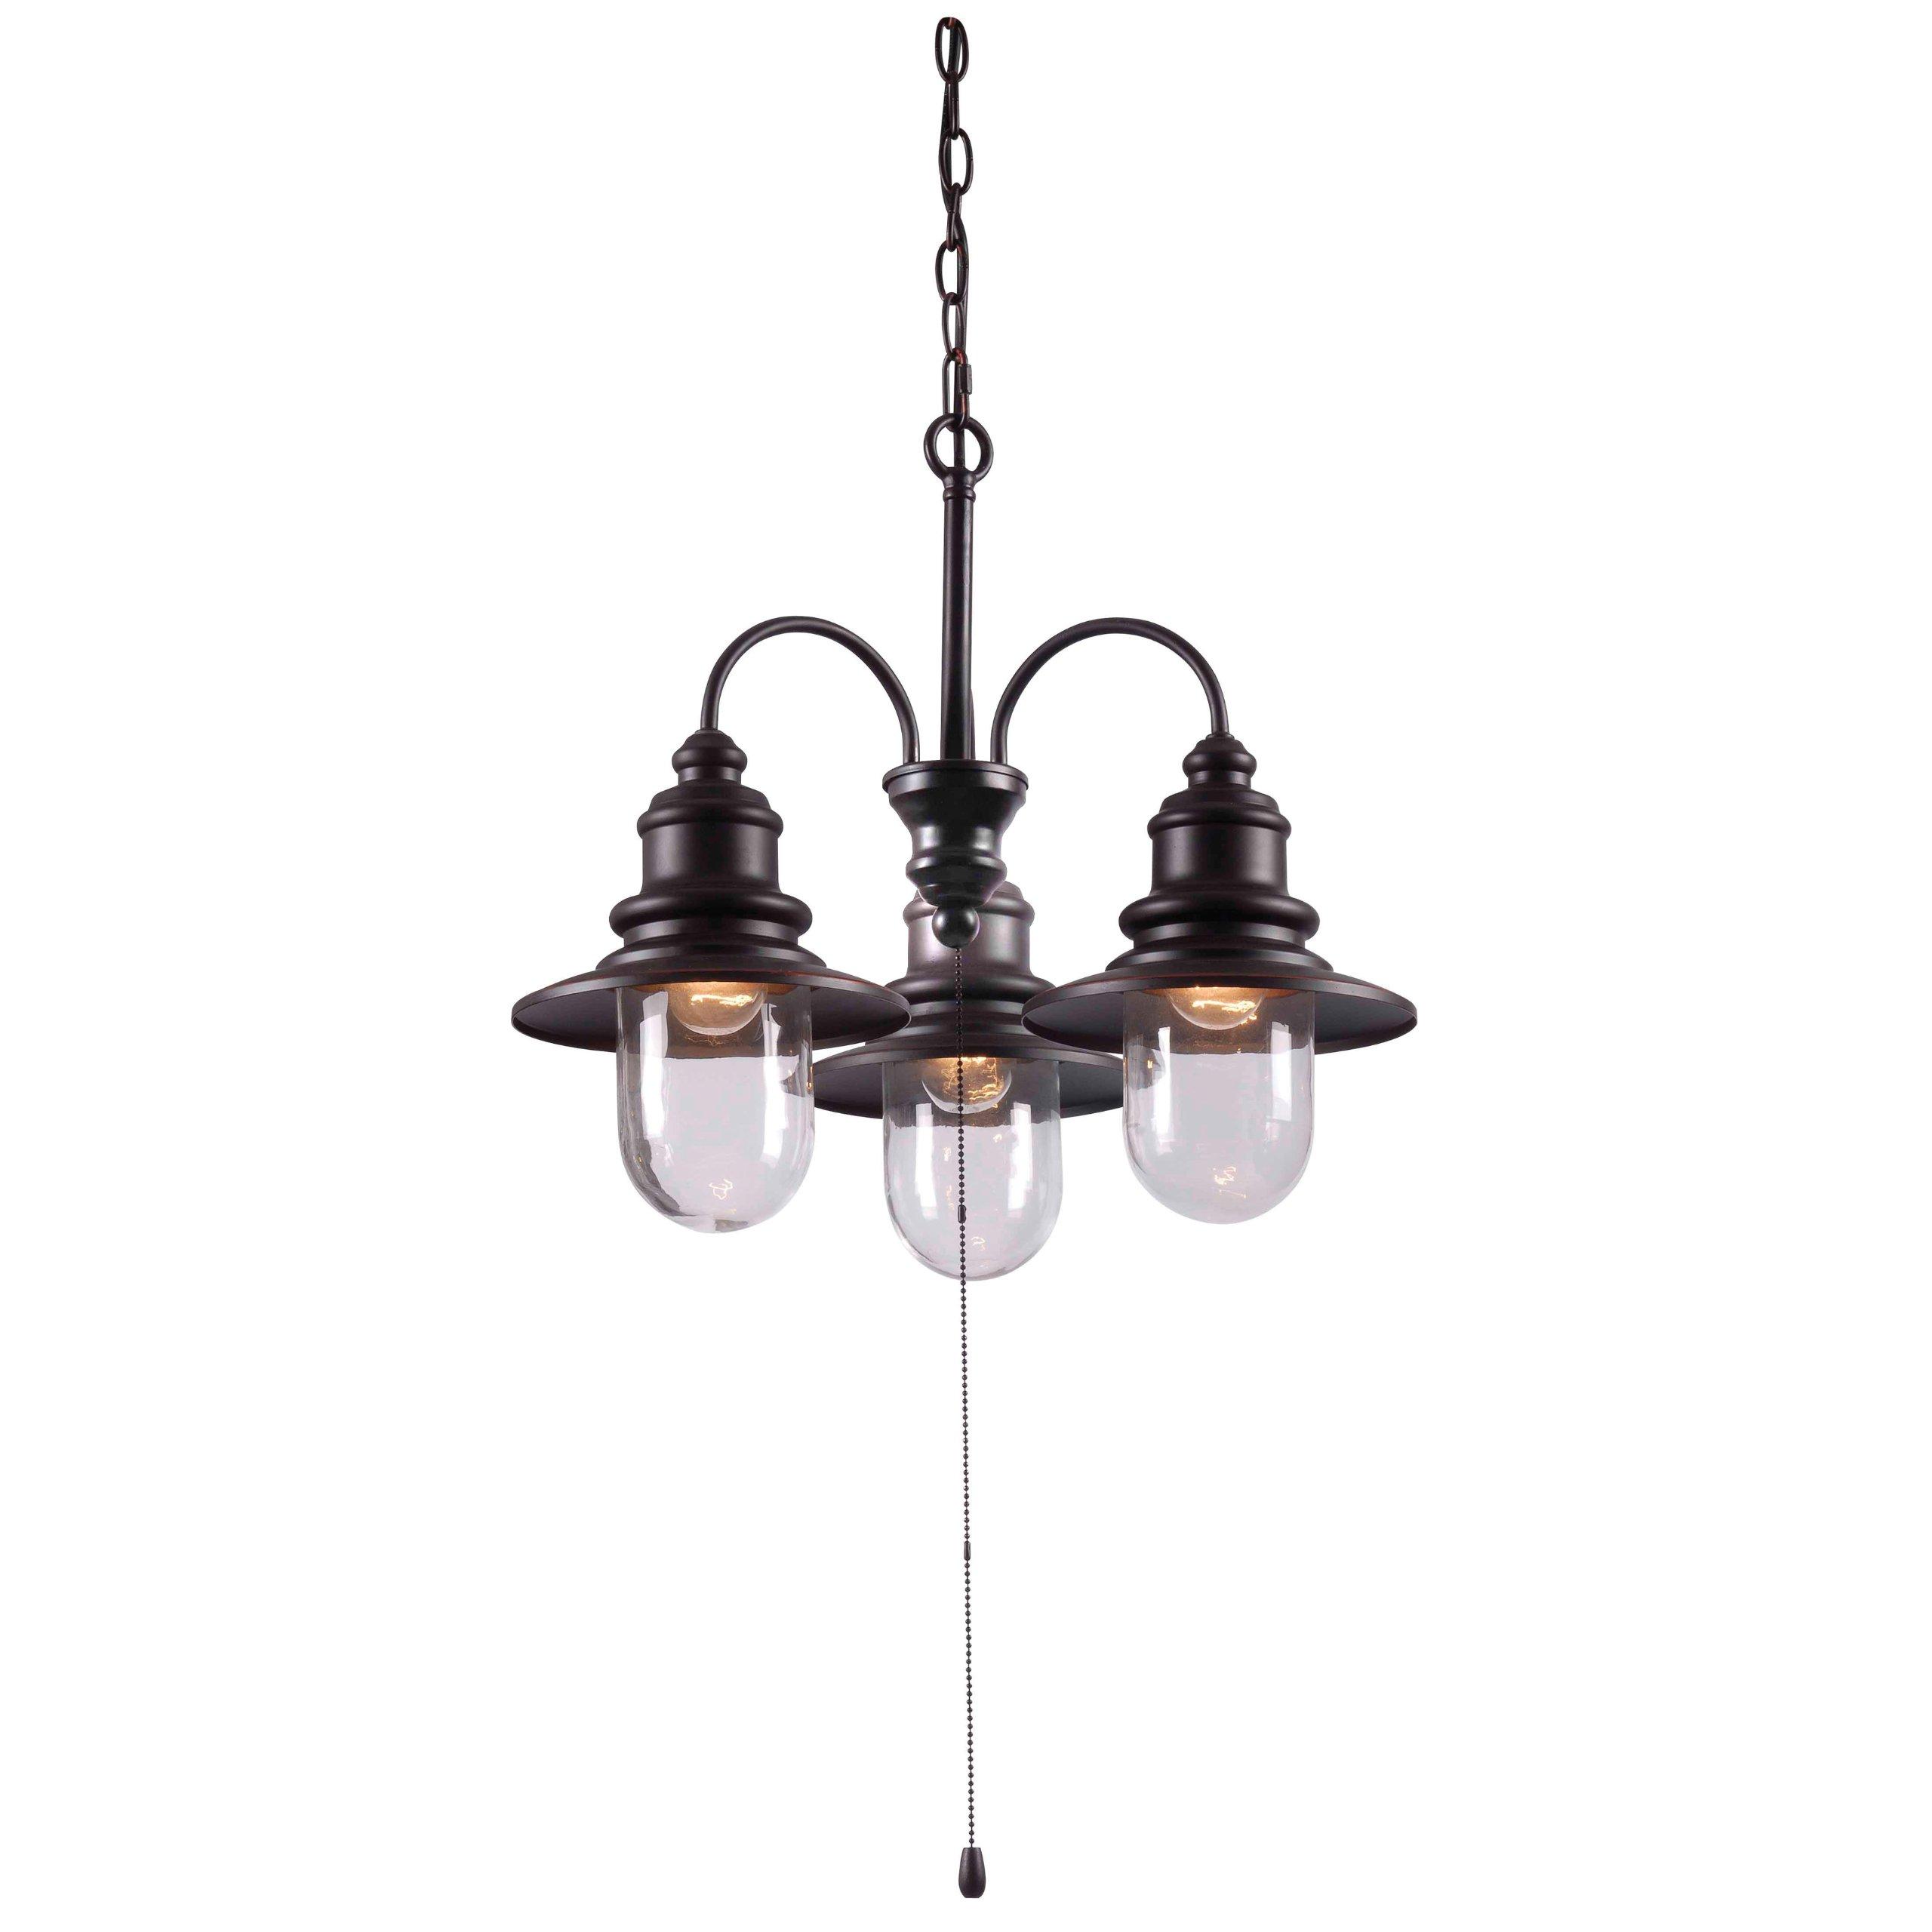 Kenroy Home 93033ORB Broadcast 3-Light Outdoor Chandelier, Blackened Oil Rubbed Bronze